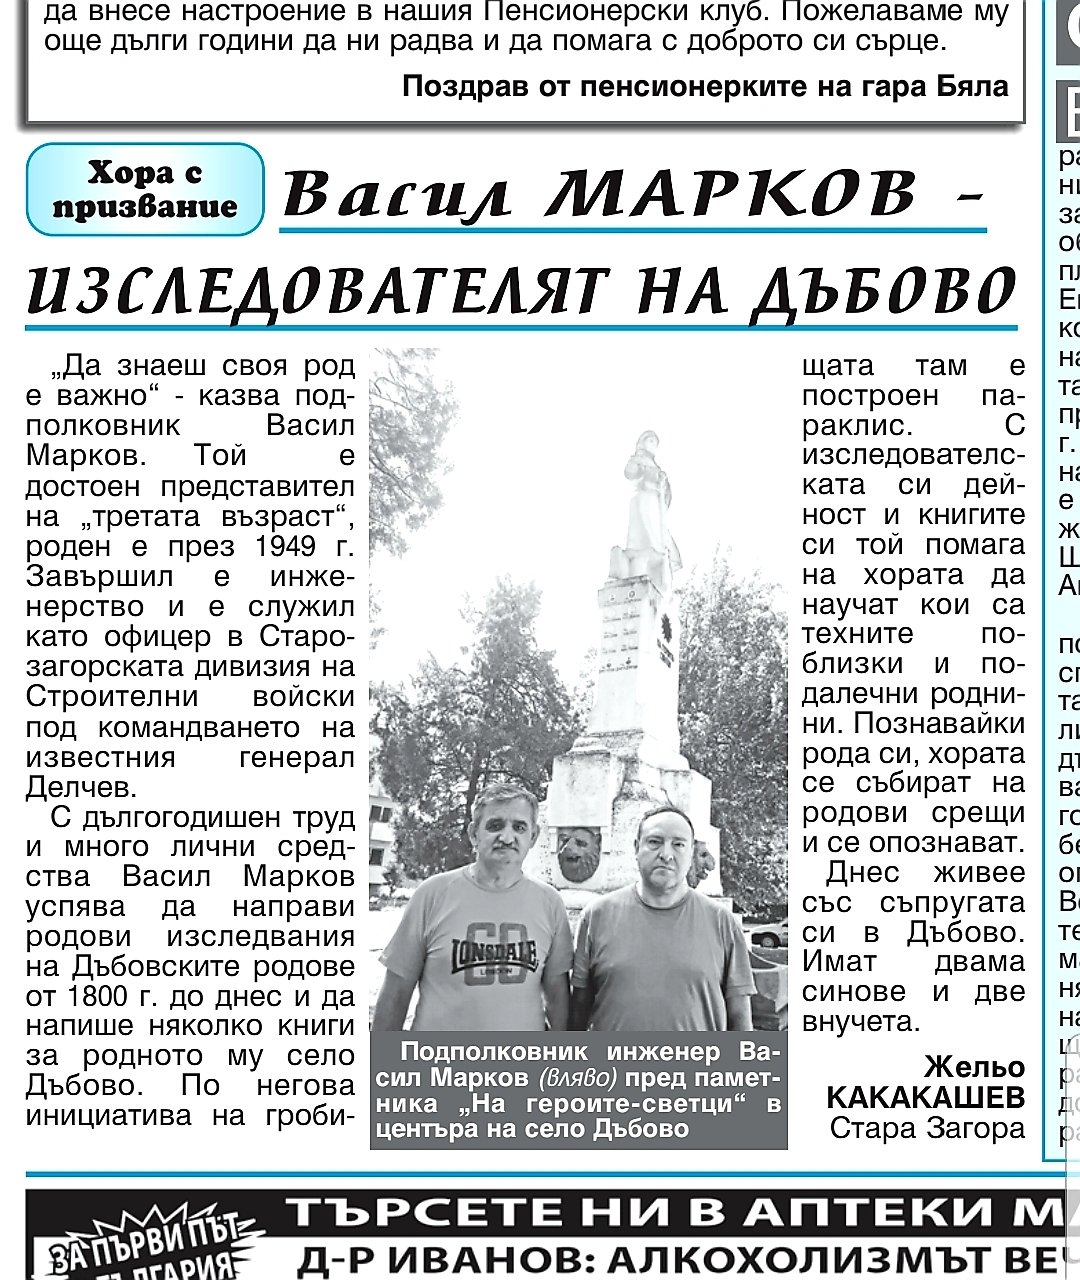 "Народно читалище ""Развитие-1921г."" с. Дъбово"